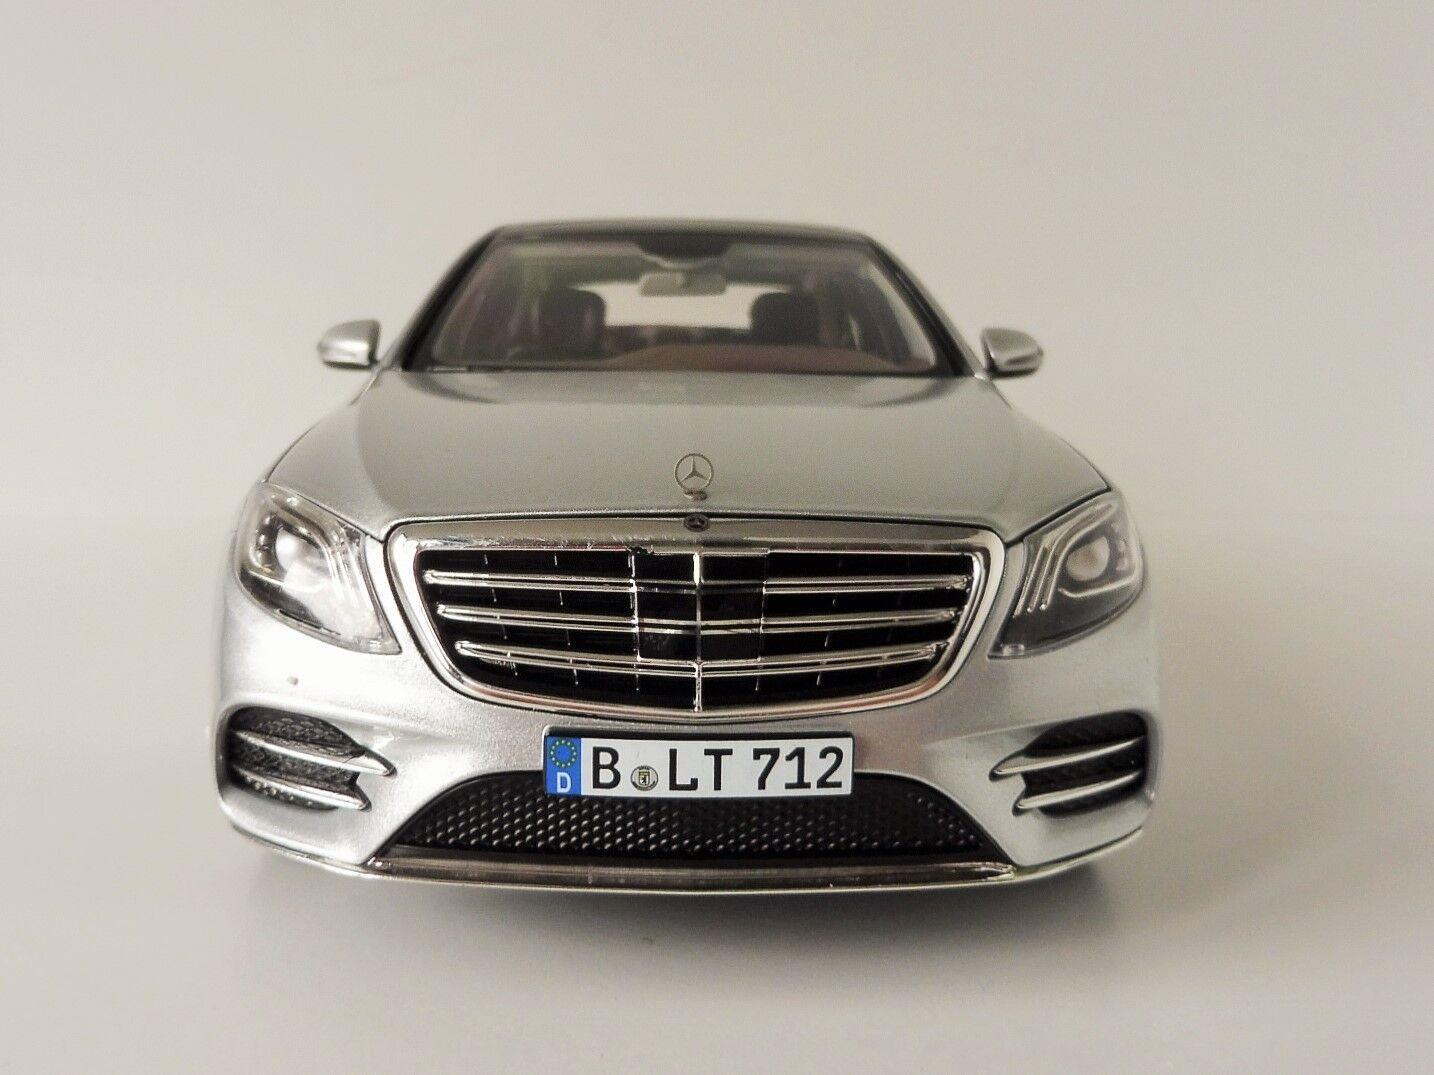 MERCEDES BENZ CLASE S AMG 2018 argento 118 Norev 183479 CLASE S Mercedes 222